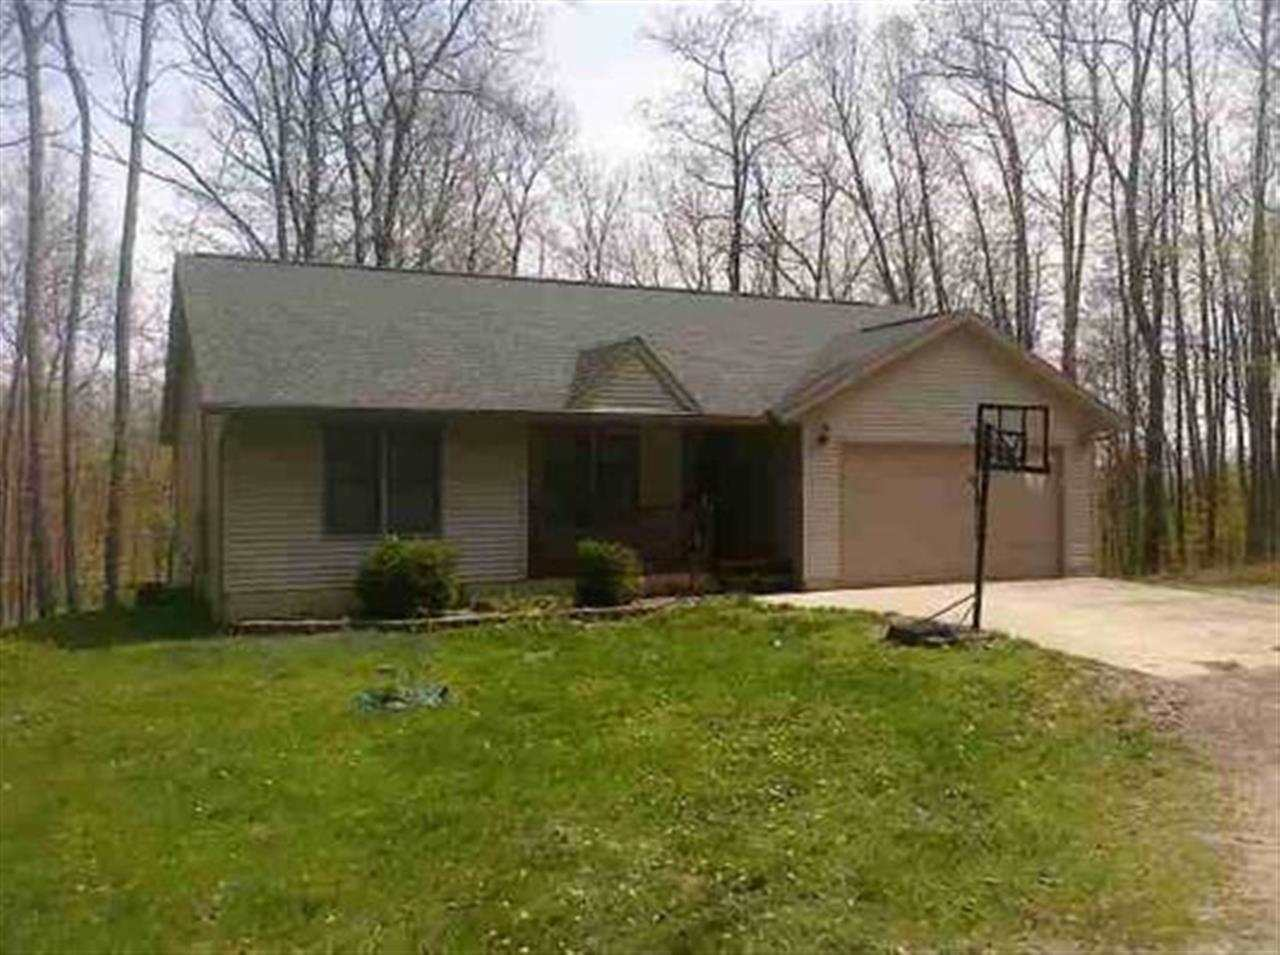 Real Estate for Sale, ListingId: 32326298, Farwell,MI48622